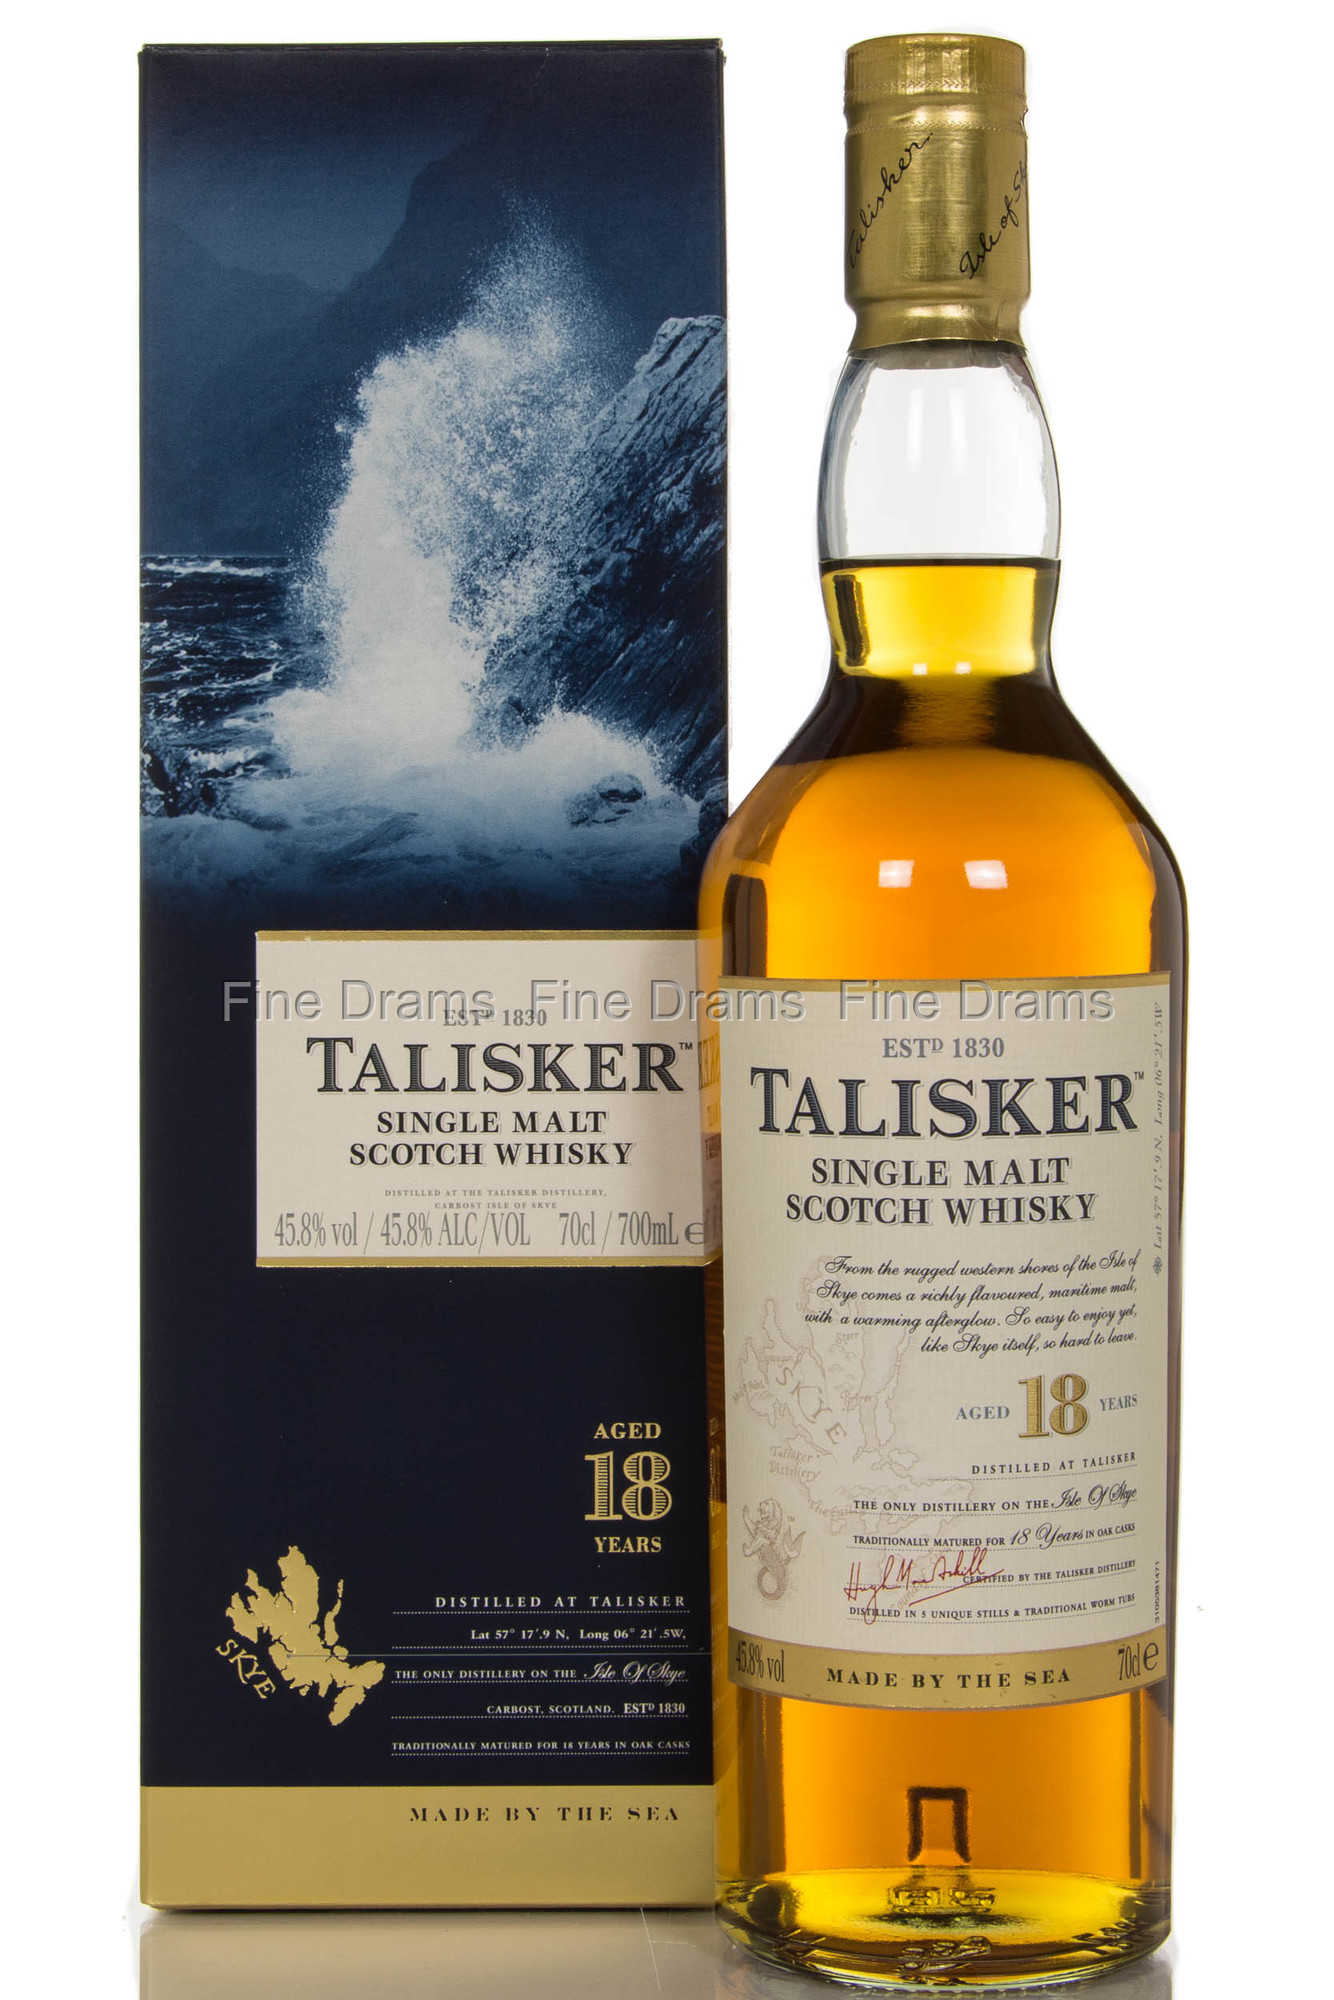 18 Years Old Vietnamese: Talisker 18 Year Old Scotch Single Malt Whisky